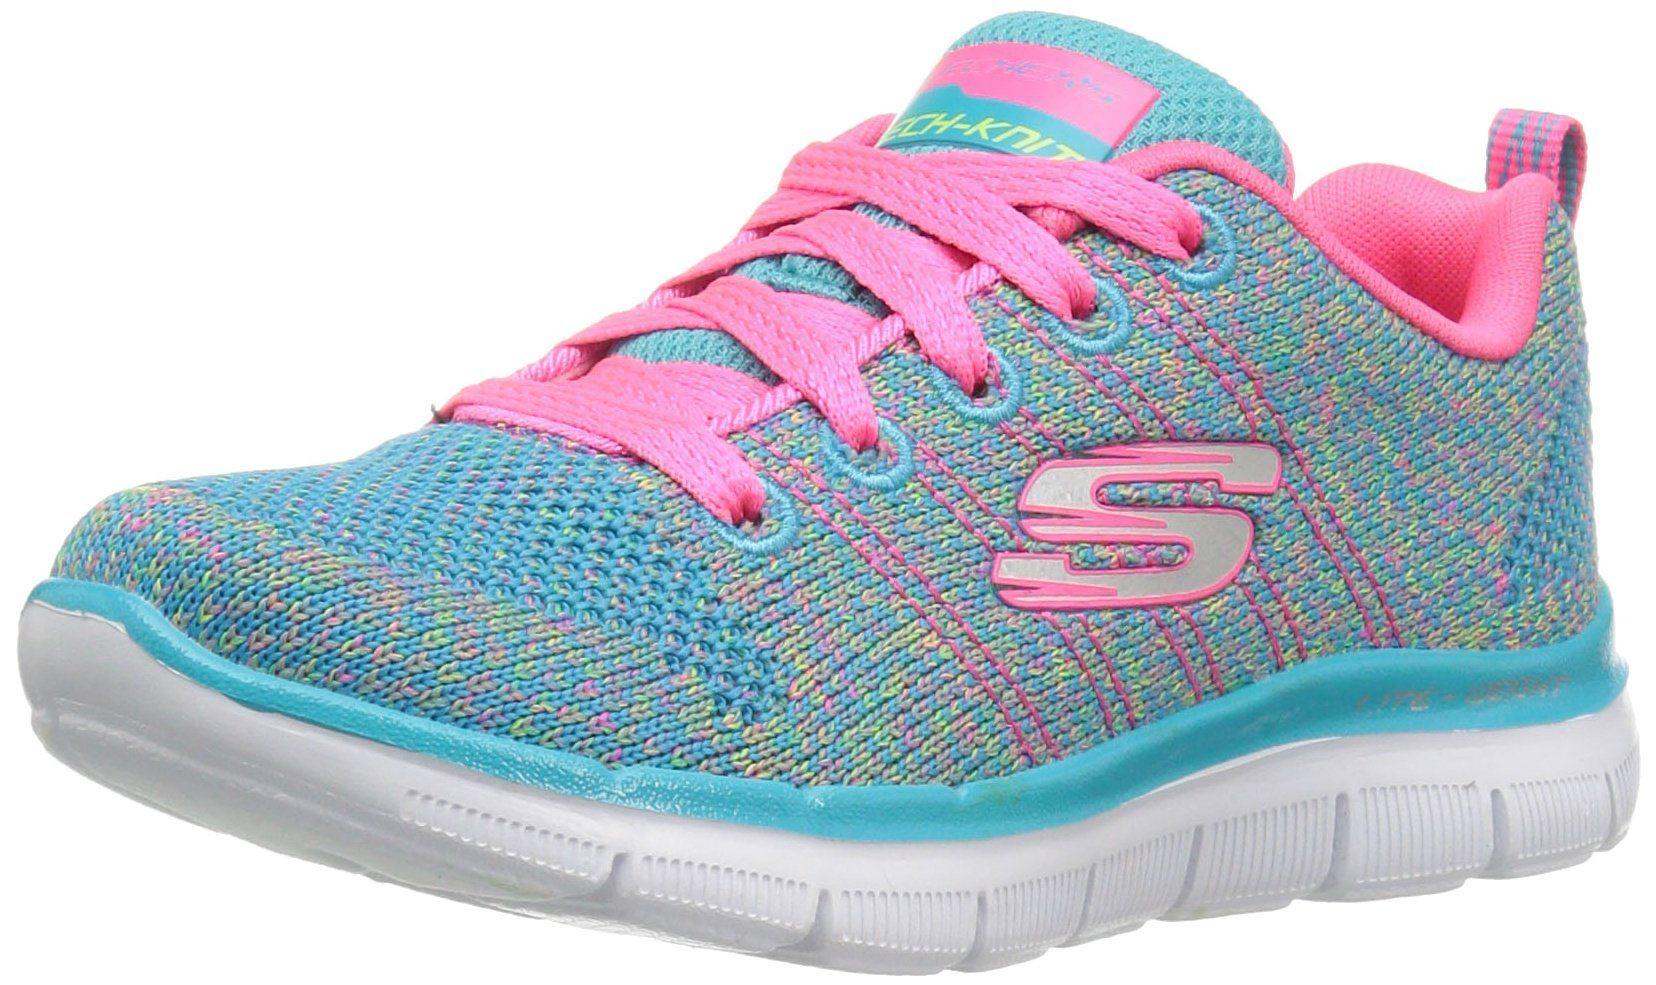 07169eb0557e Skechers Kids Girls  Skech Appeal 2.0-High Energy Sneaker